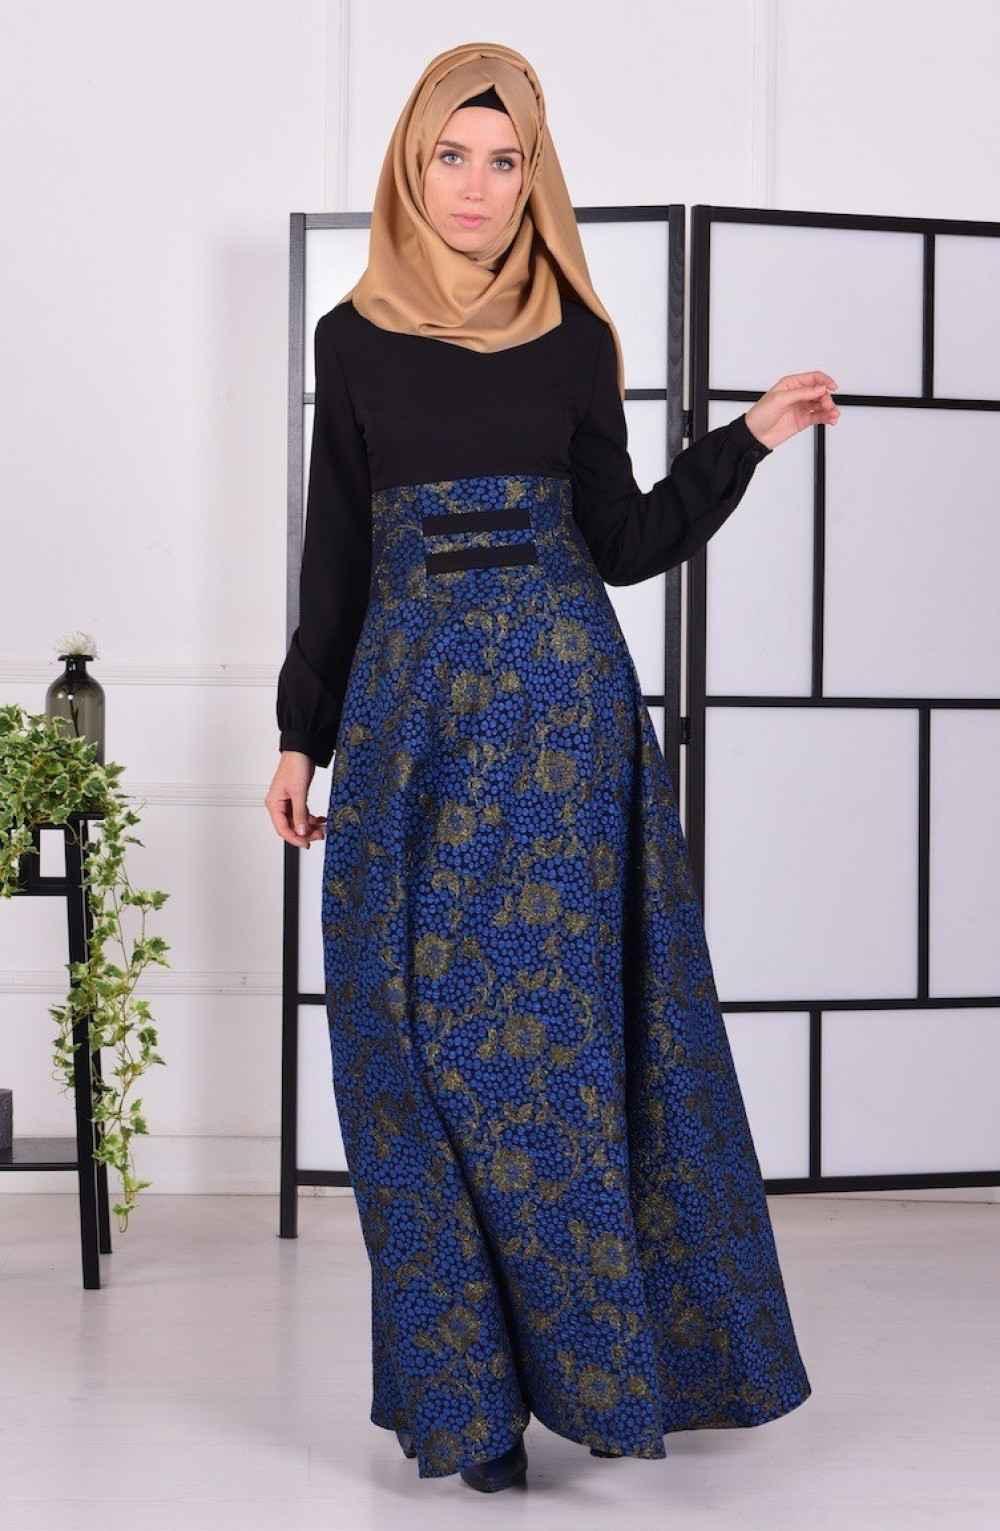 Sefamerve Korsajlı Tesettür Saks Elbise Modelleri